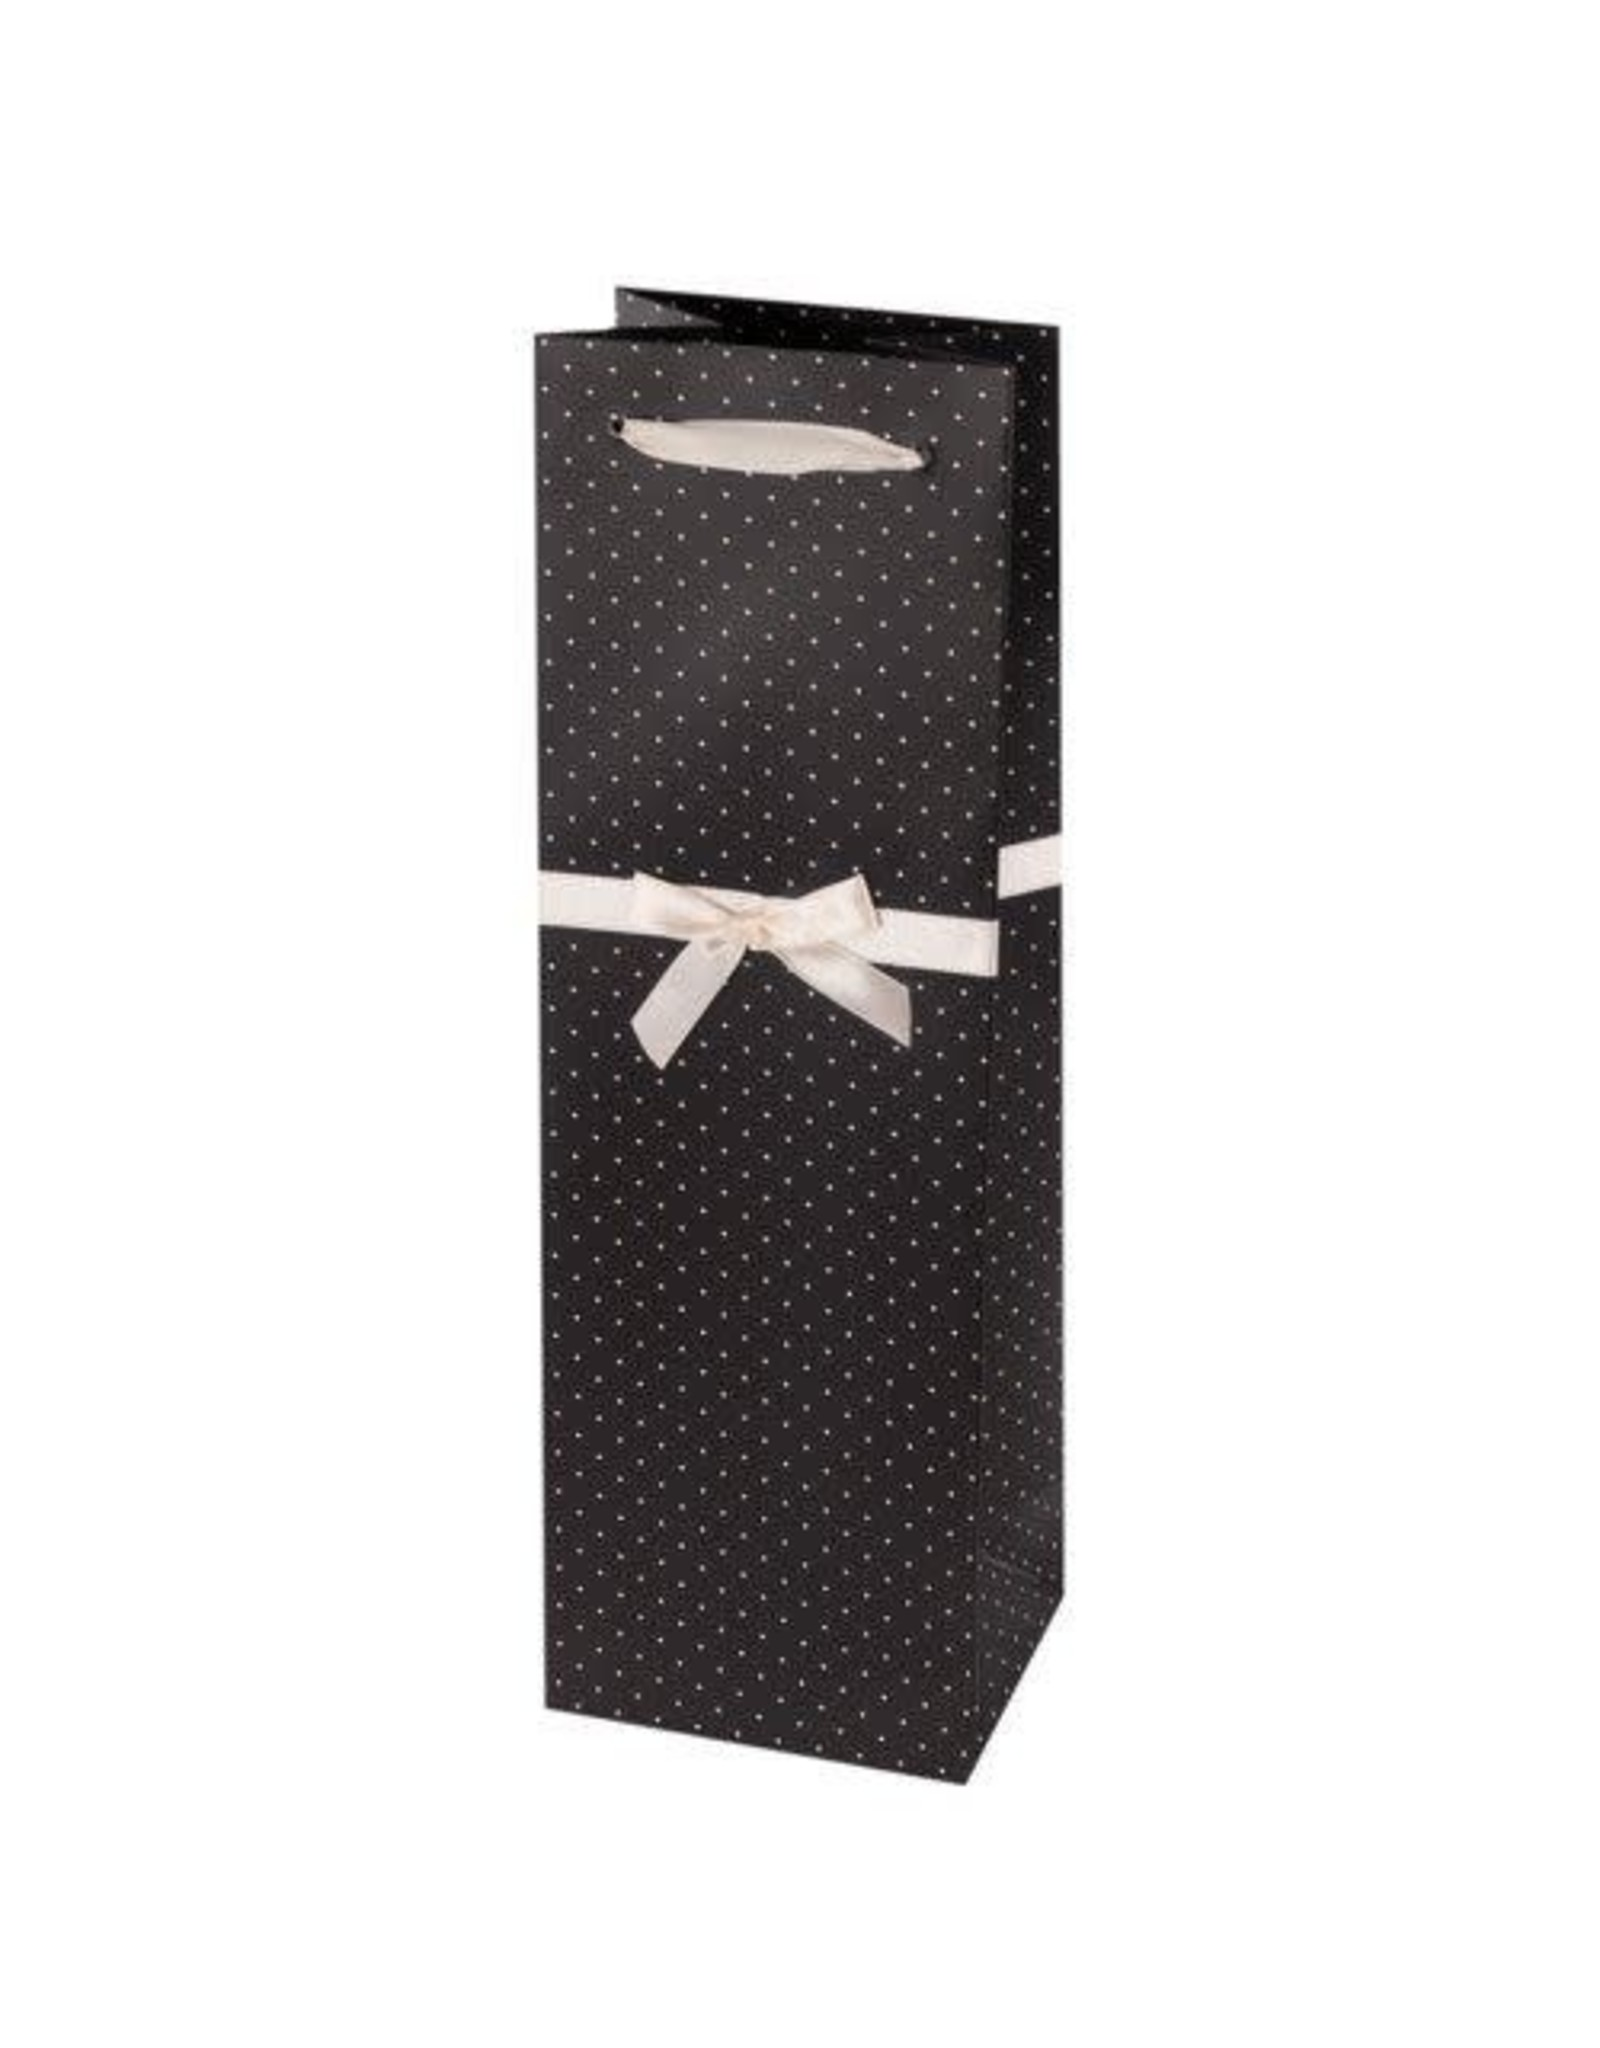 USA Elegant Black w/ White Dots Wine Bag